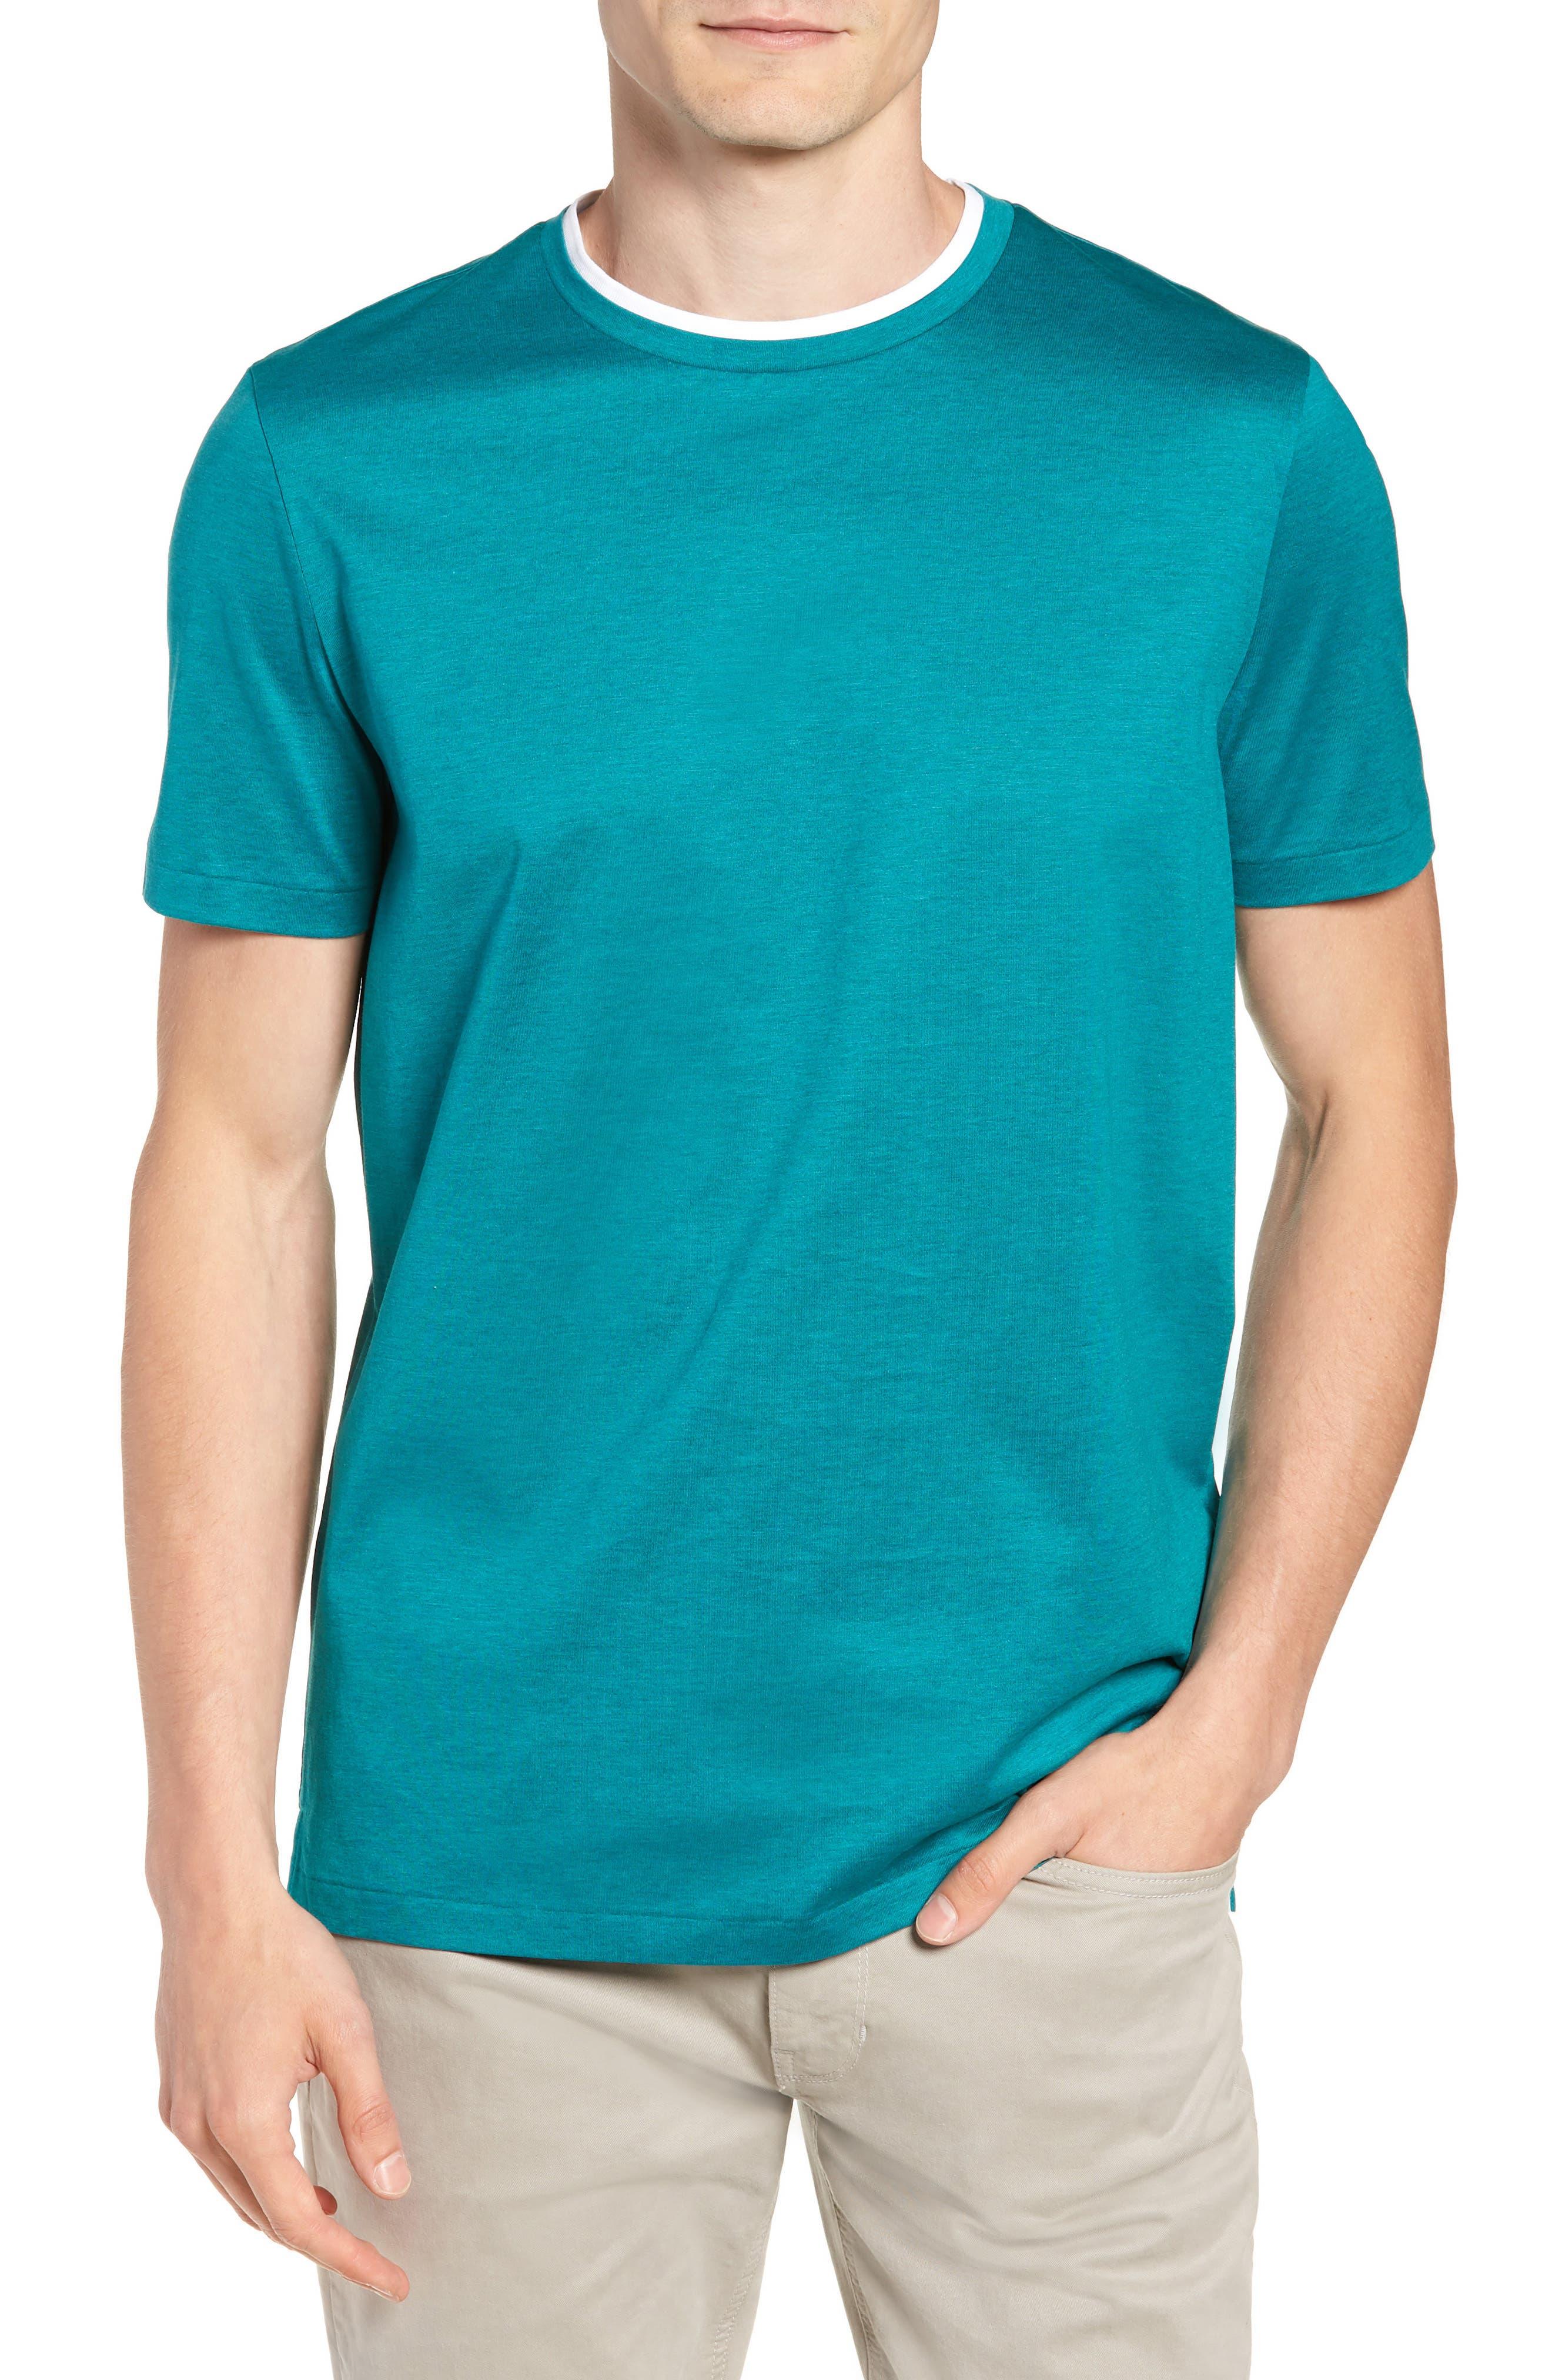 Taber Regular Fit T-Shirt,                             Main thumbnail 1, color,                             GREEN